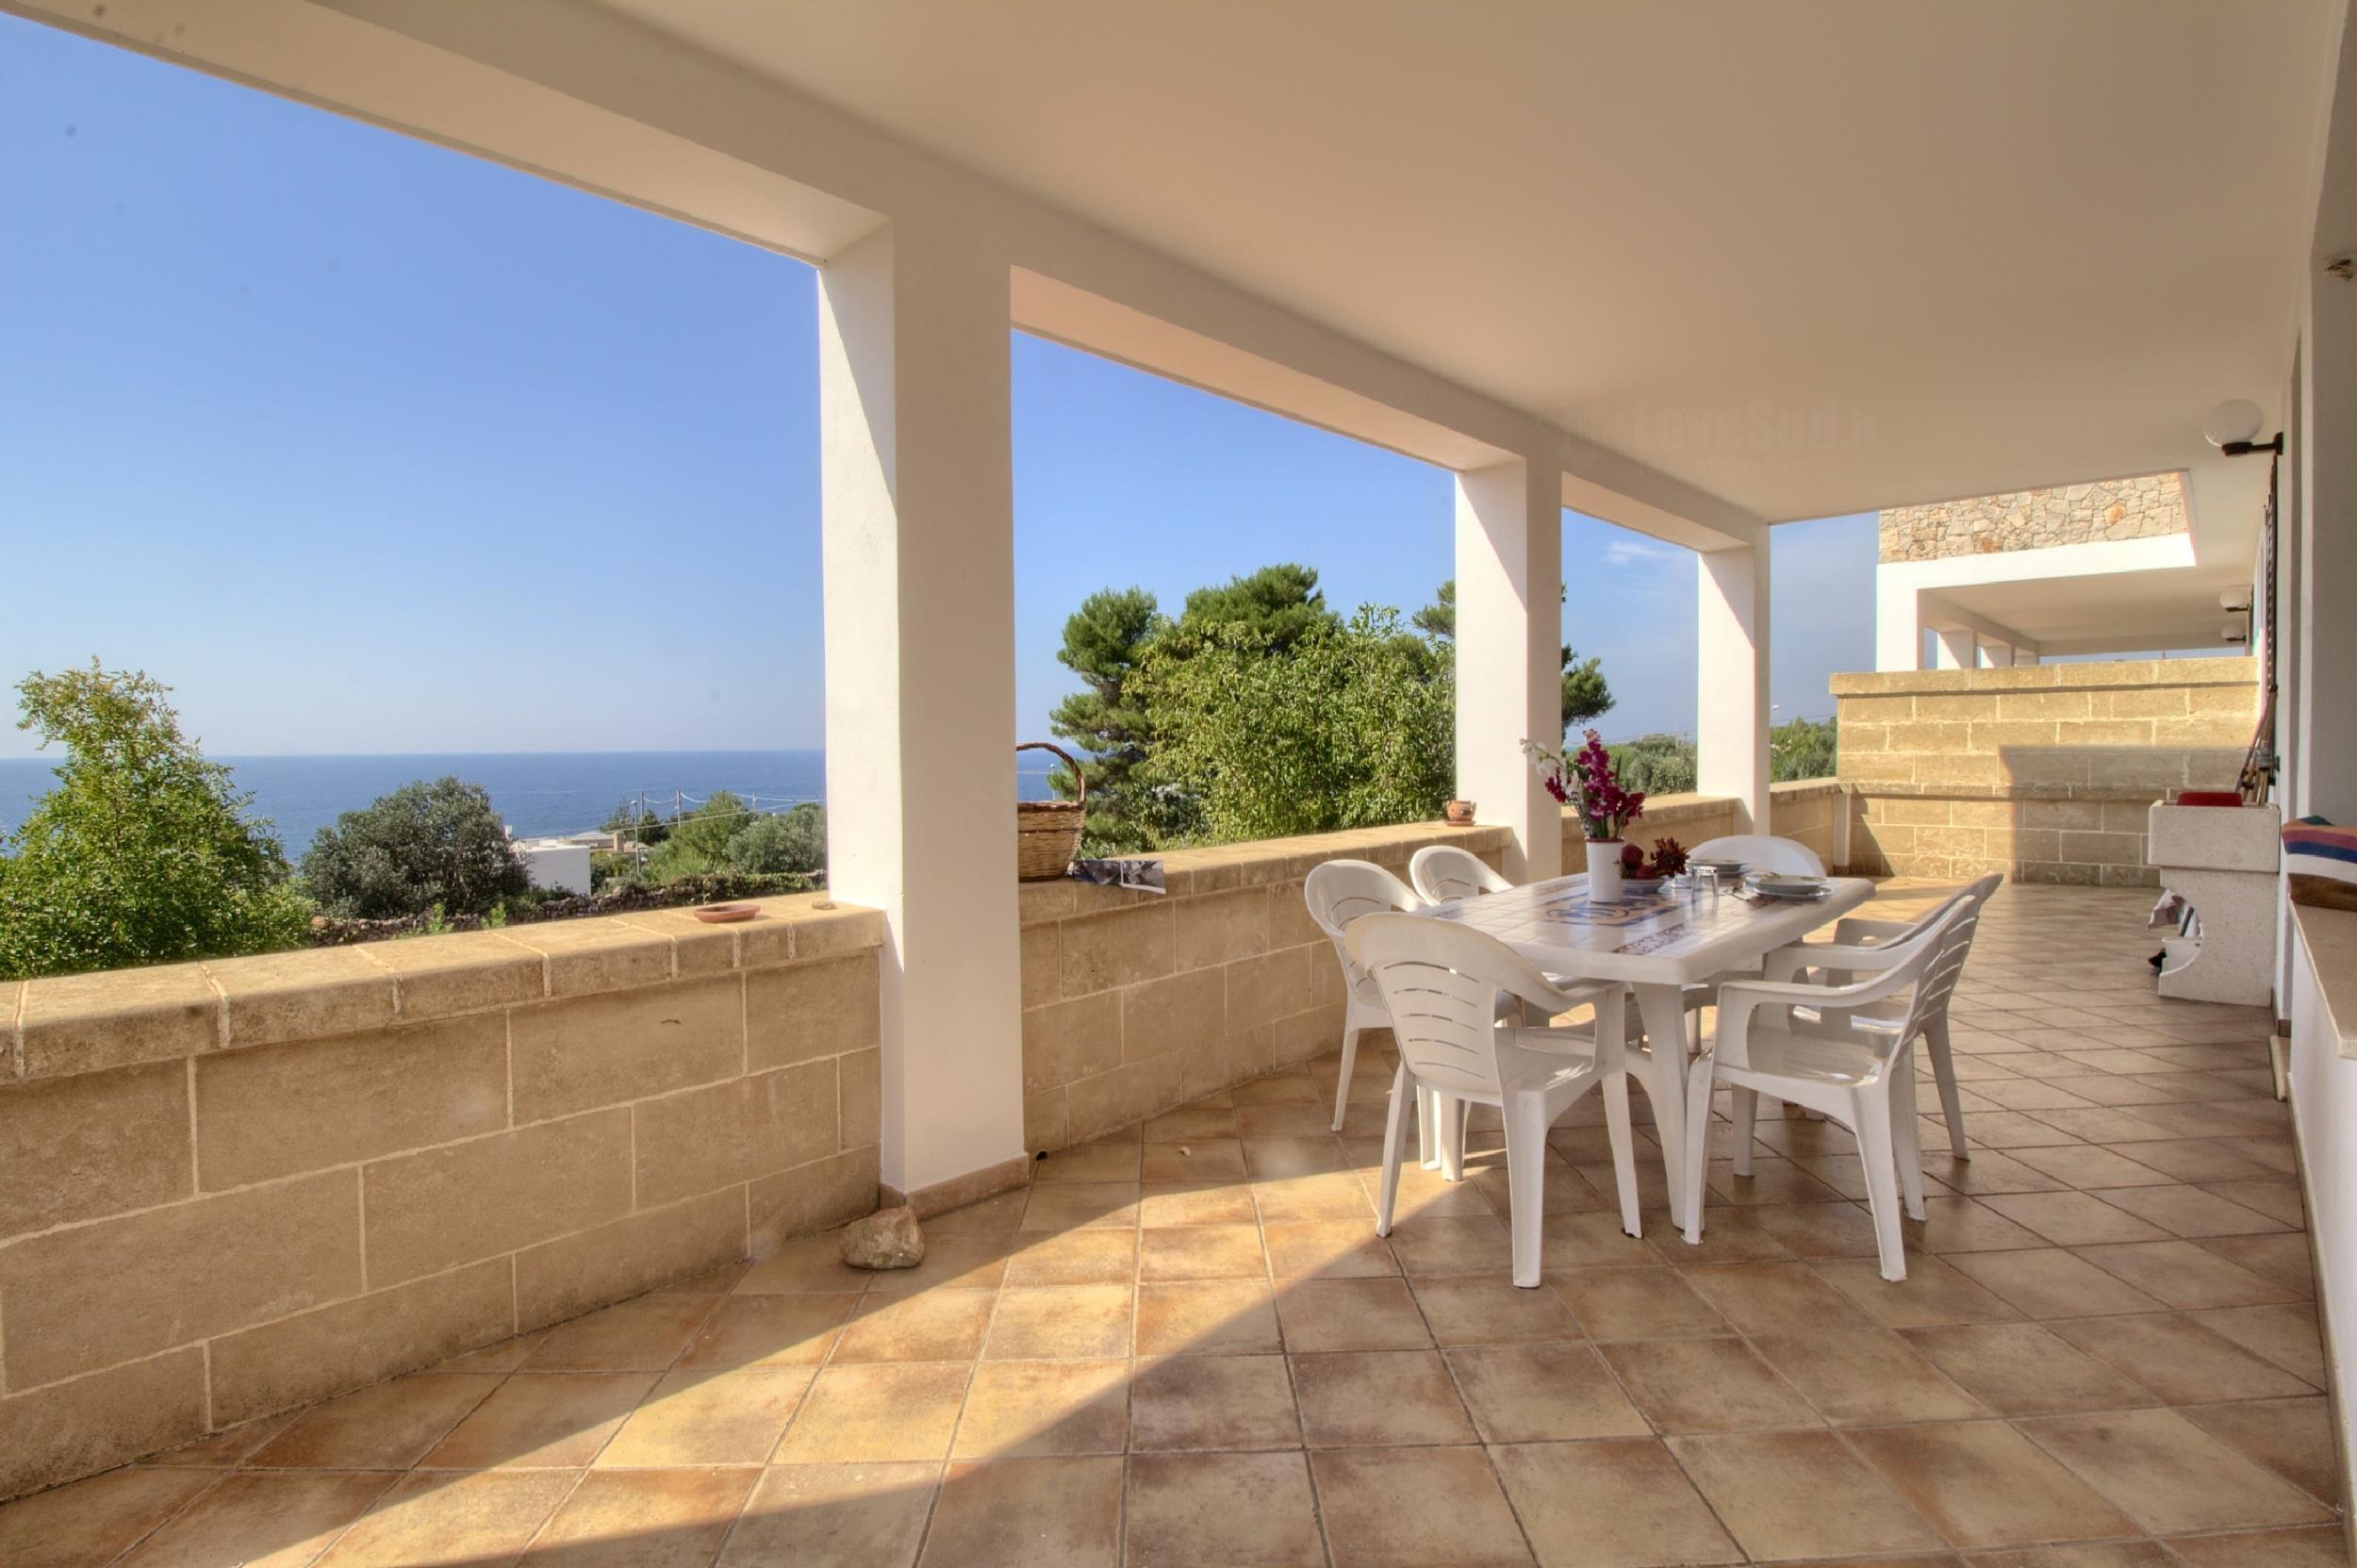 Apartment Madrigale mare vicino photo 22480403